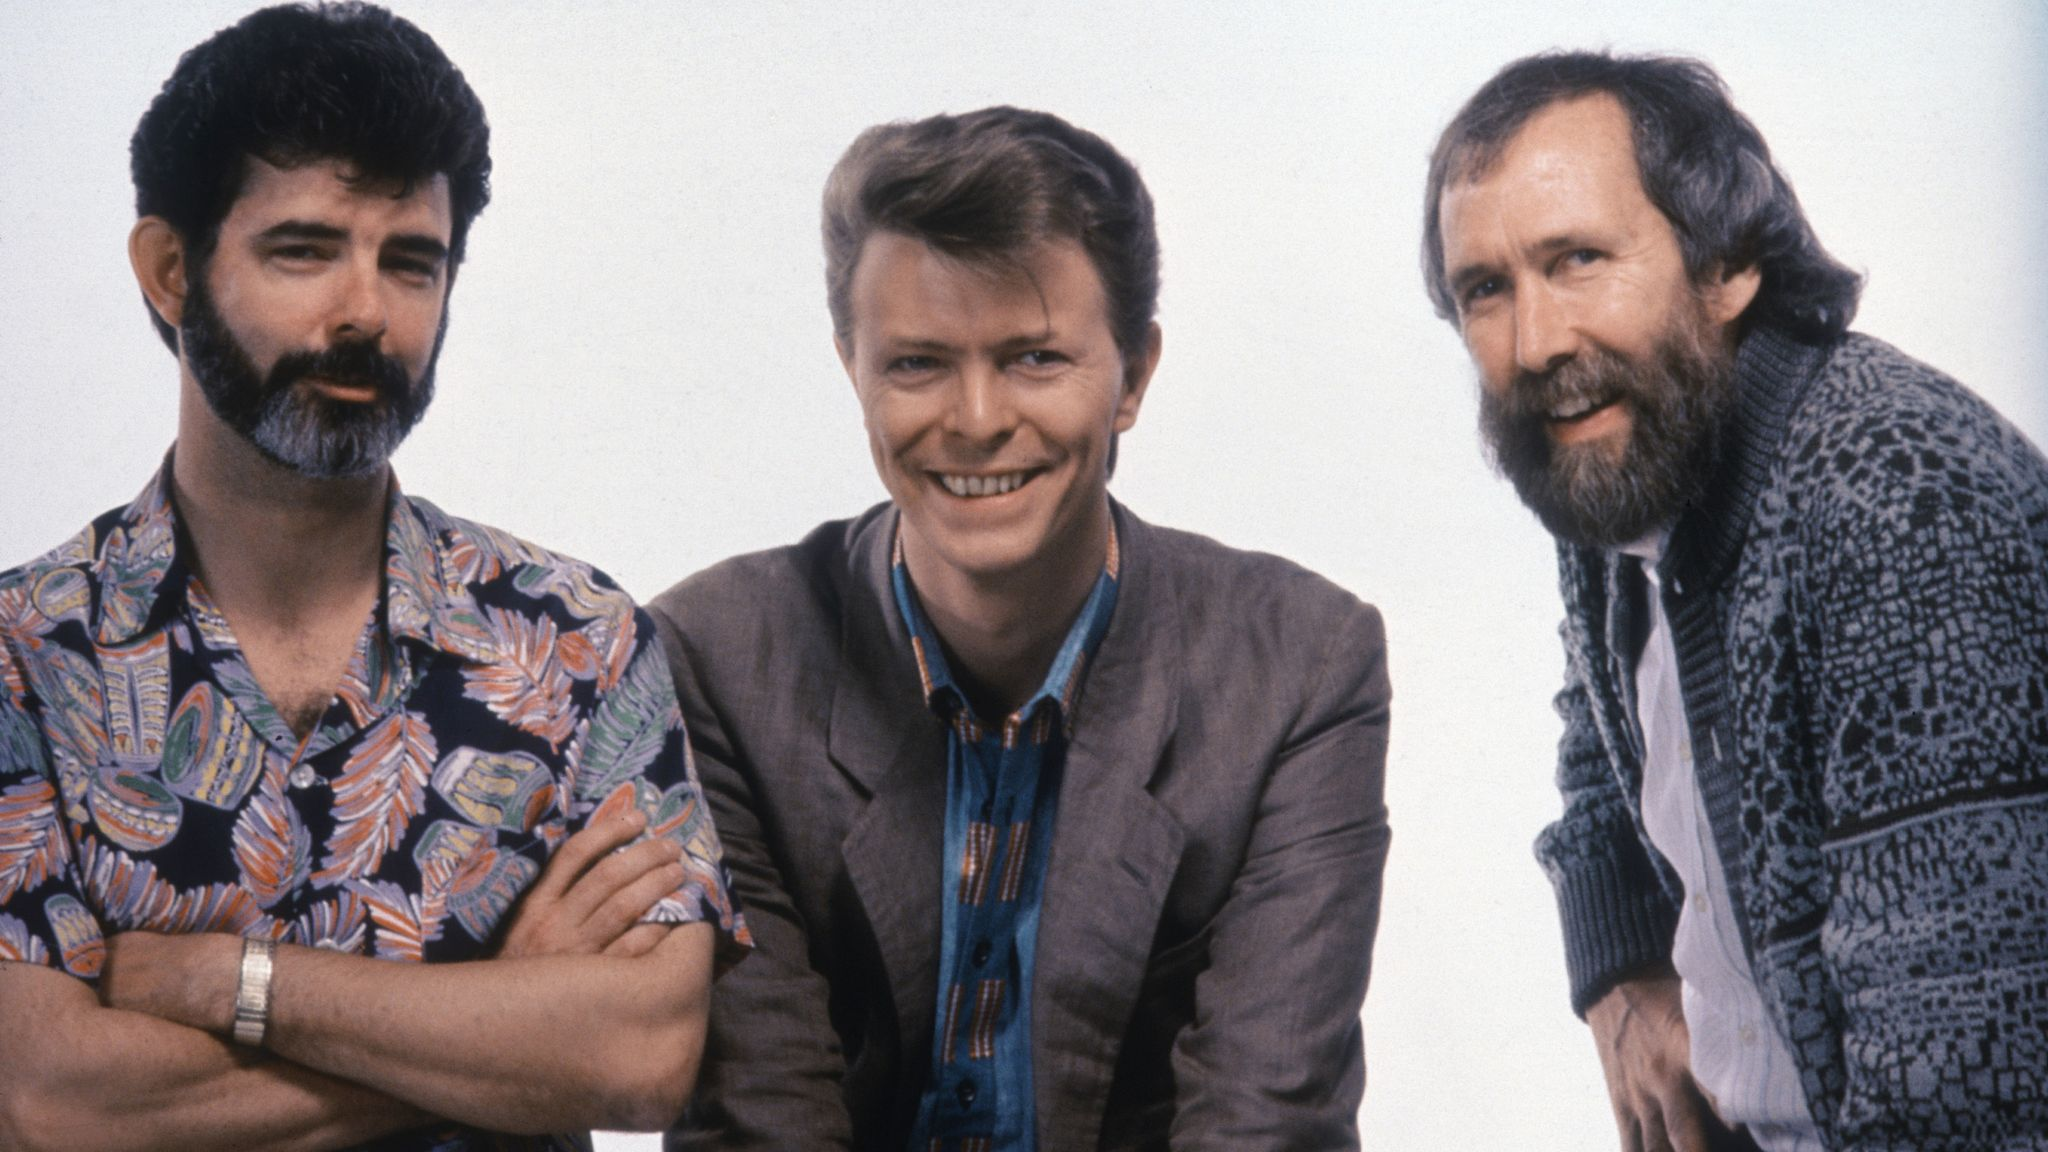 George Lucas, David Bowie, Jim Henson. Pic: Jim Henson Productions/Kobal/Shutterstock